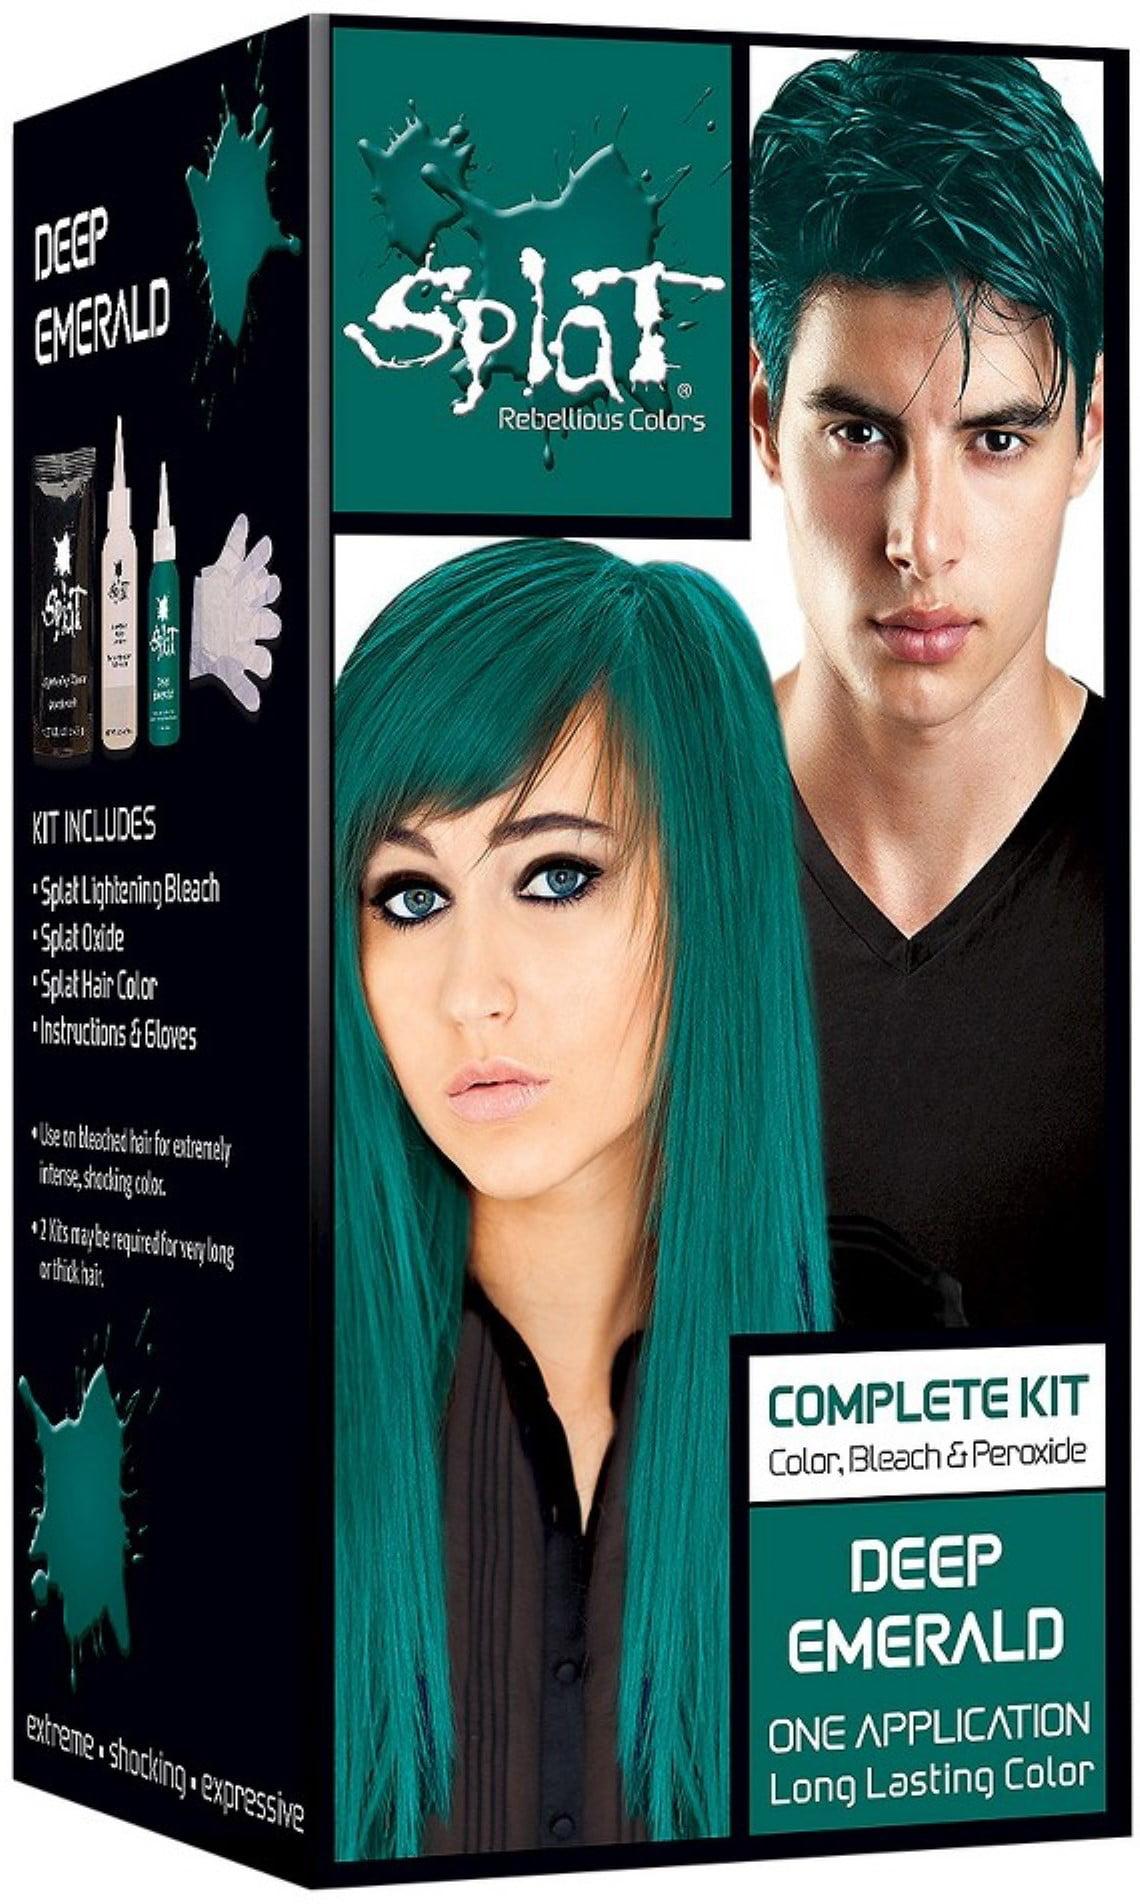 Splat Rebellious Colors Hair Coloring Complete Kit Deep Emerald 1 Ea Pack Of 3